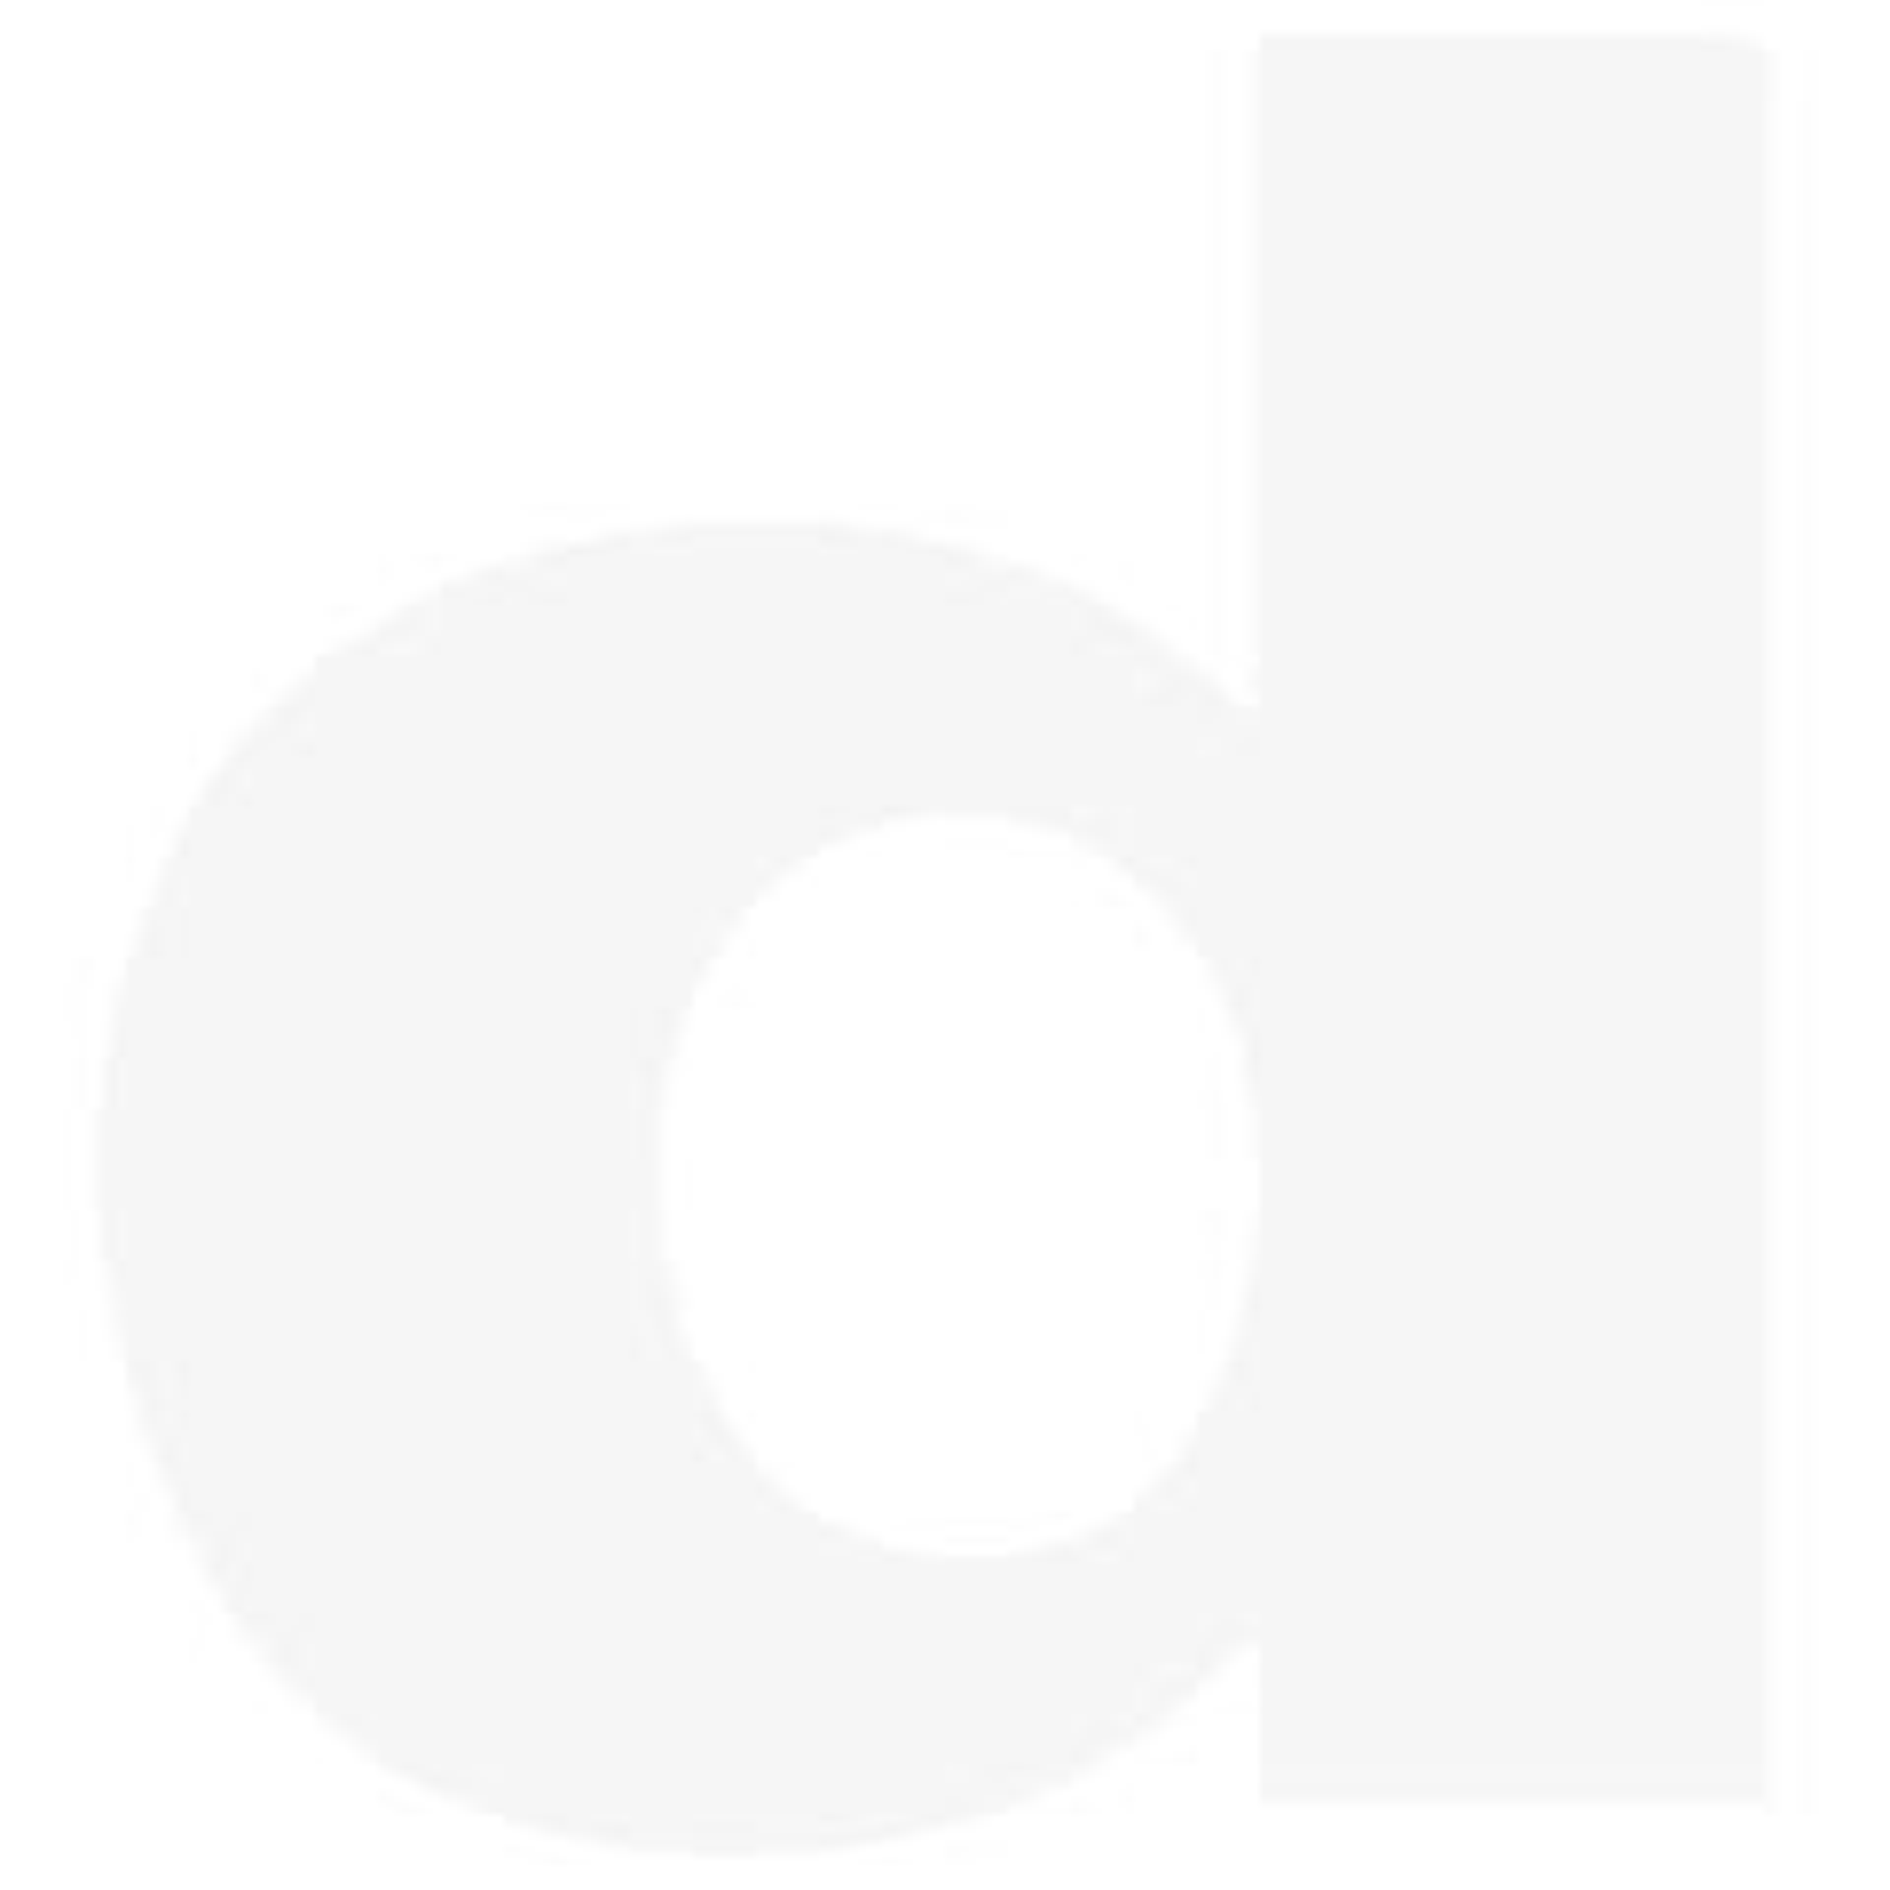 Whirlpool refrigeradores